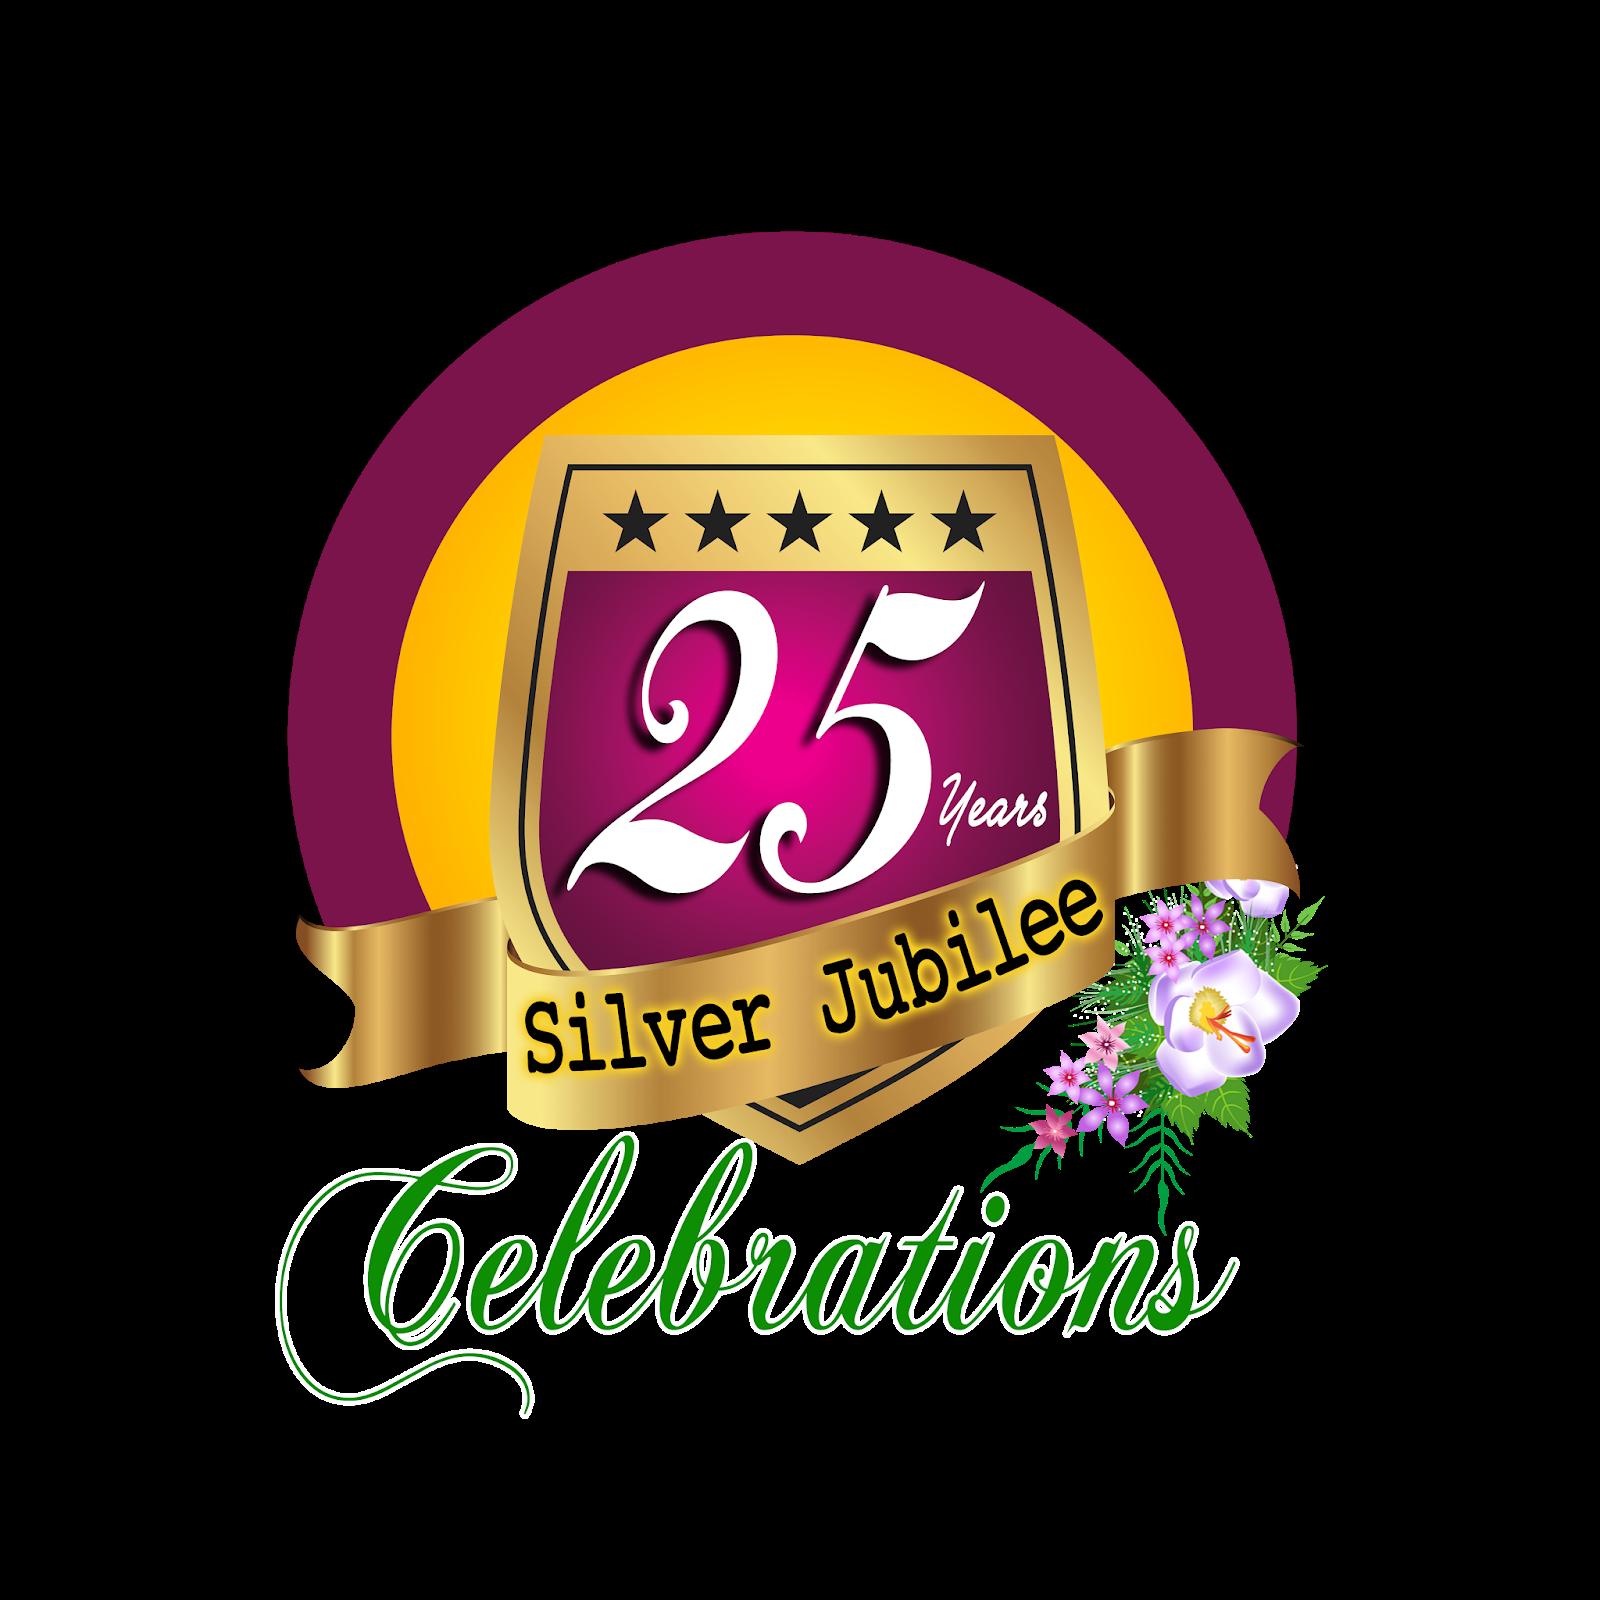 25 years silver jubilee celebrations hd png logo free.